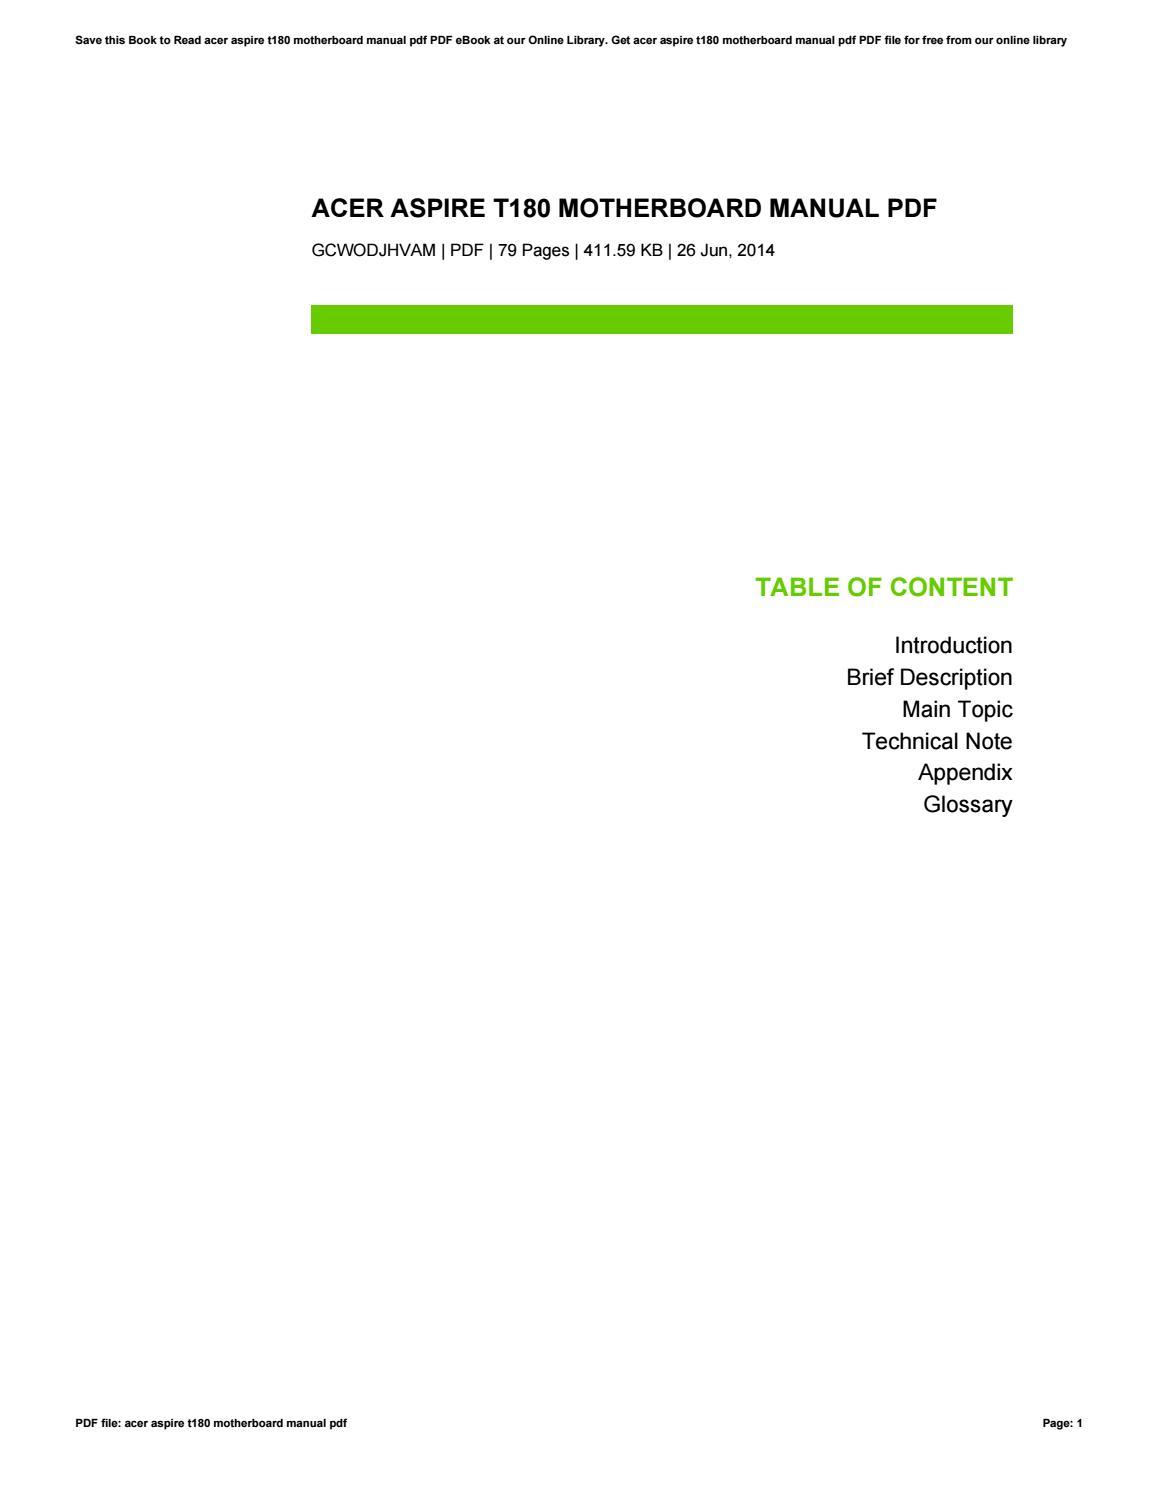 Motherboard Manual Pdf